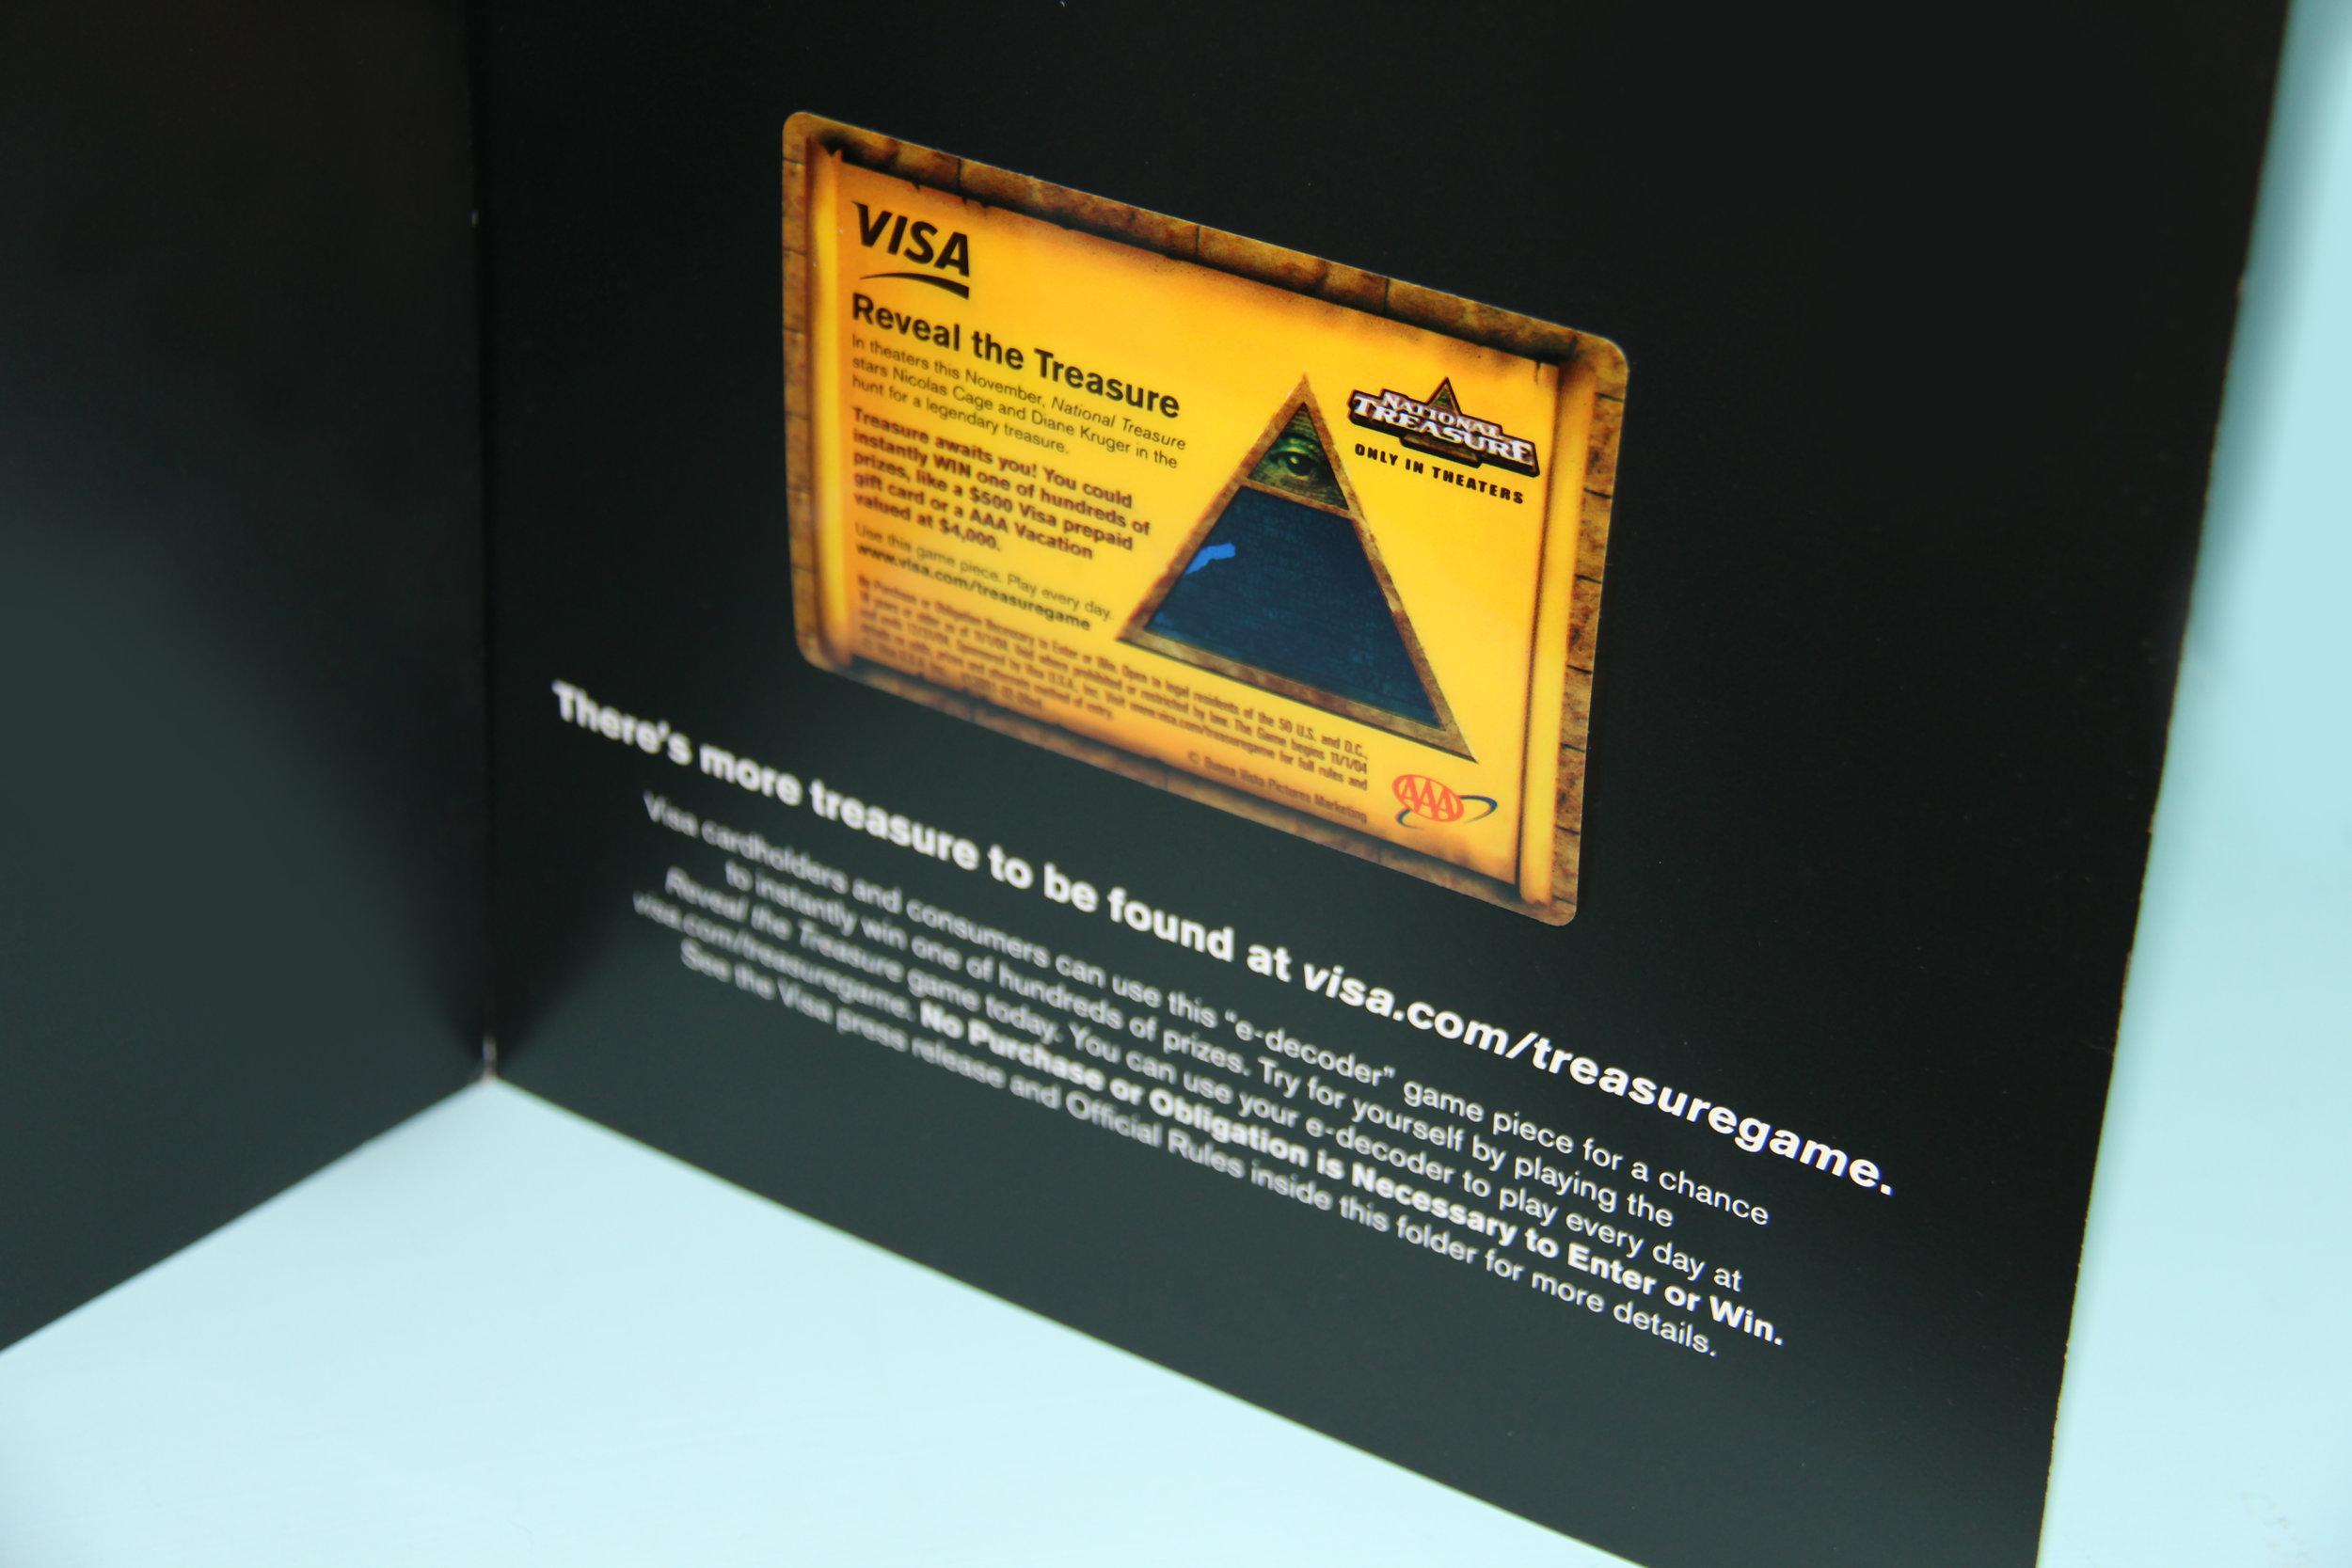 Visa Holiday Promotion Game piece eDecoder